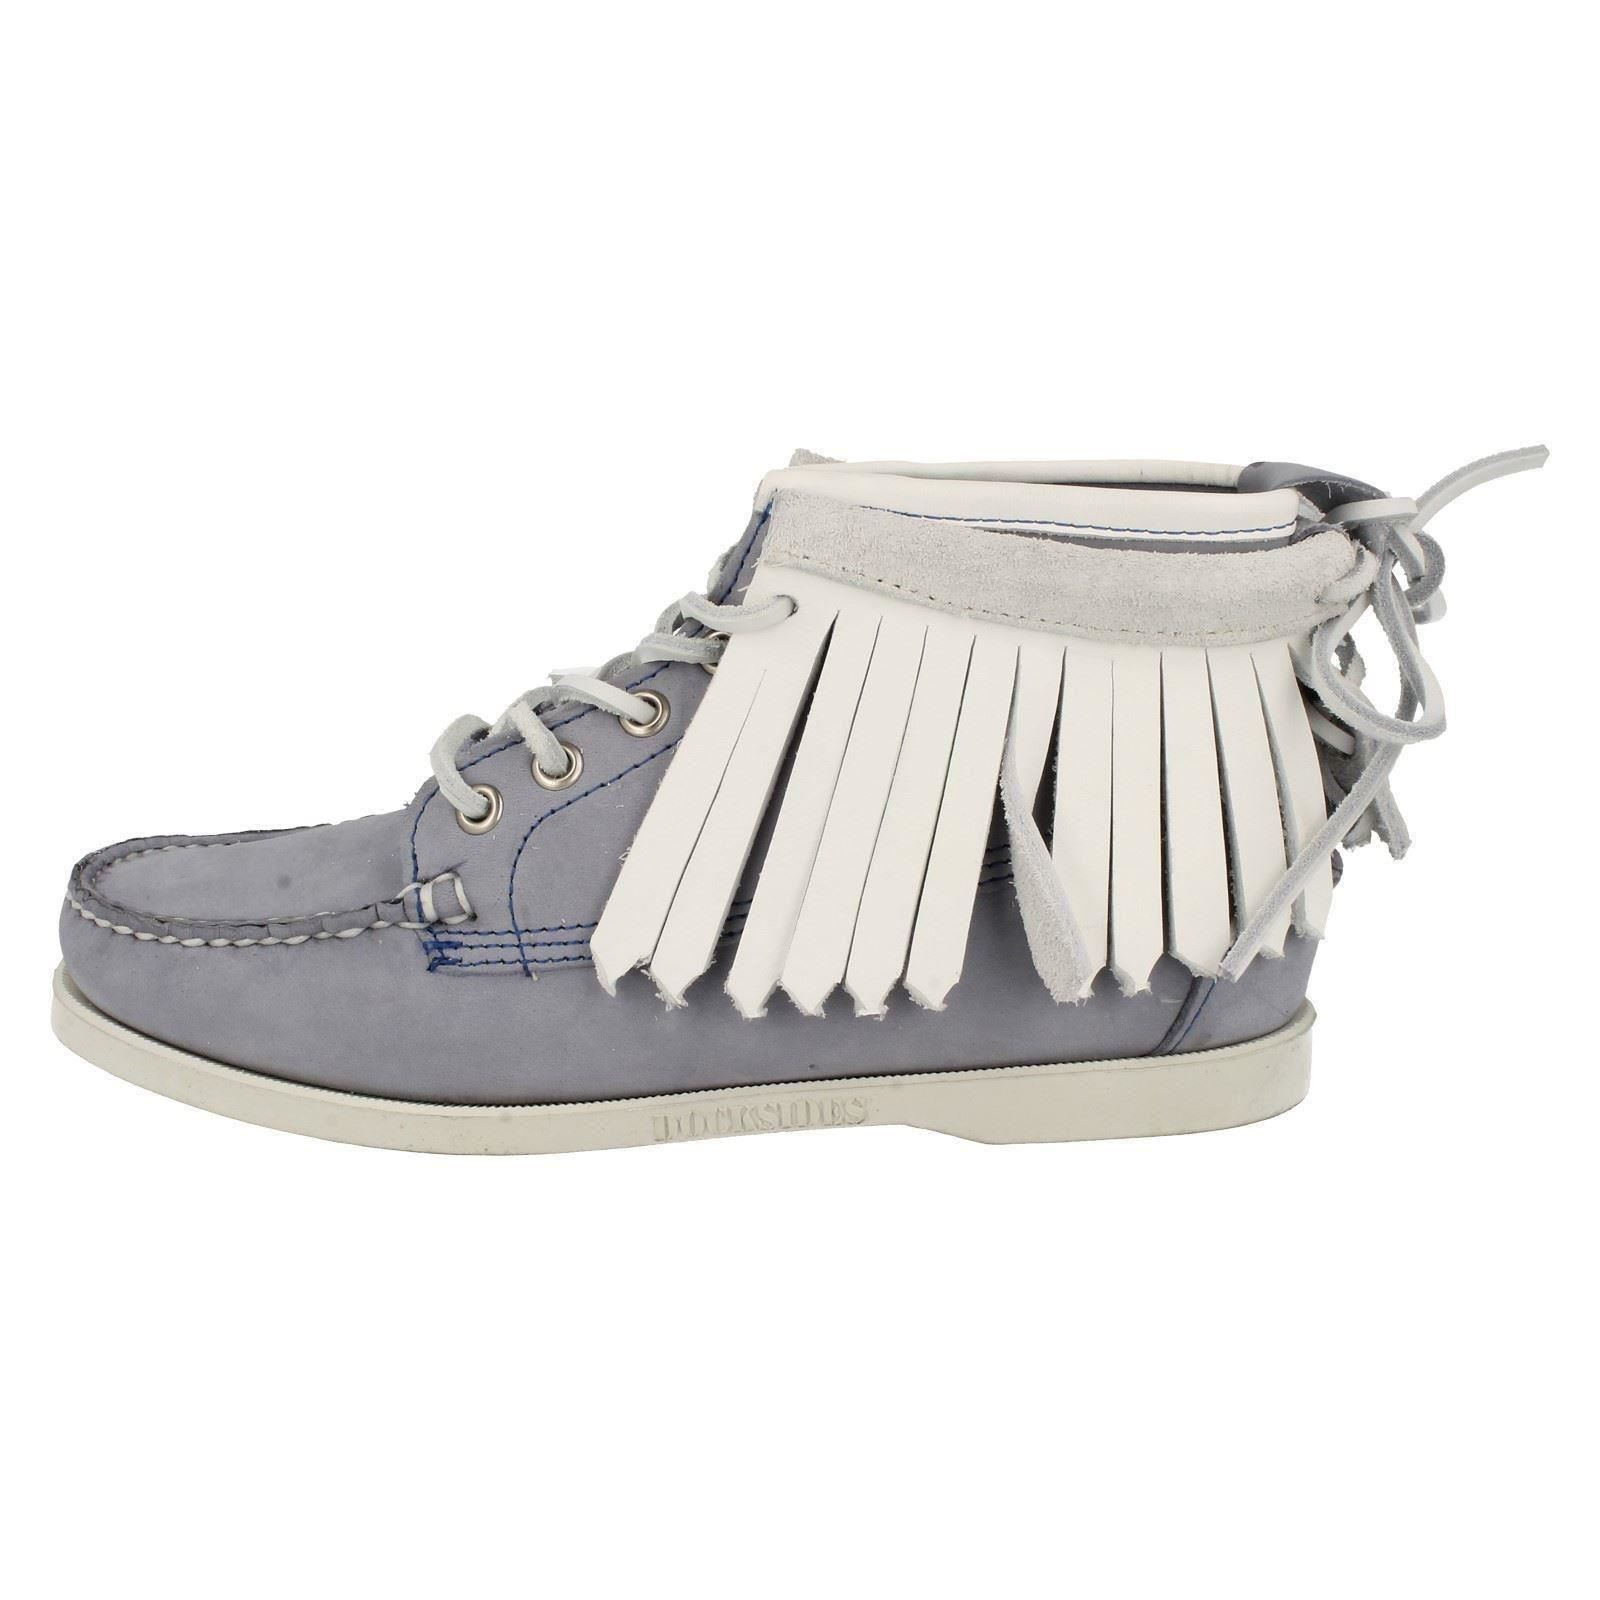 Ladies-Sebago-Fringed-Ankle-Boots-Abenaki